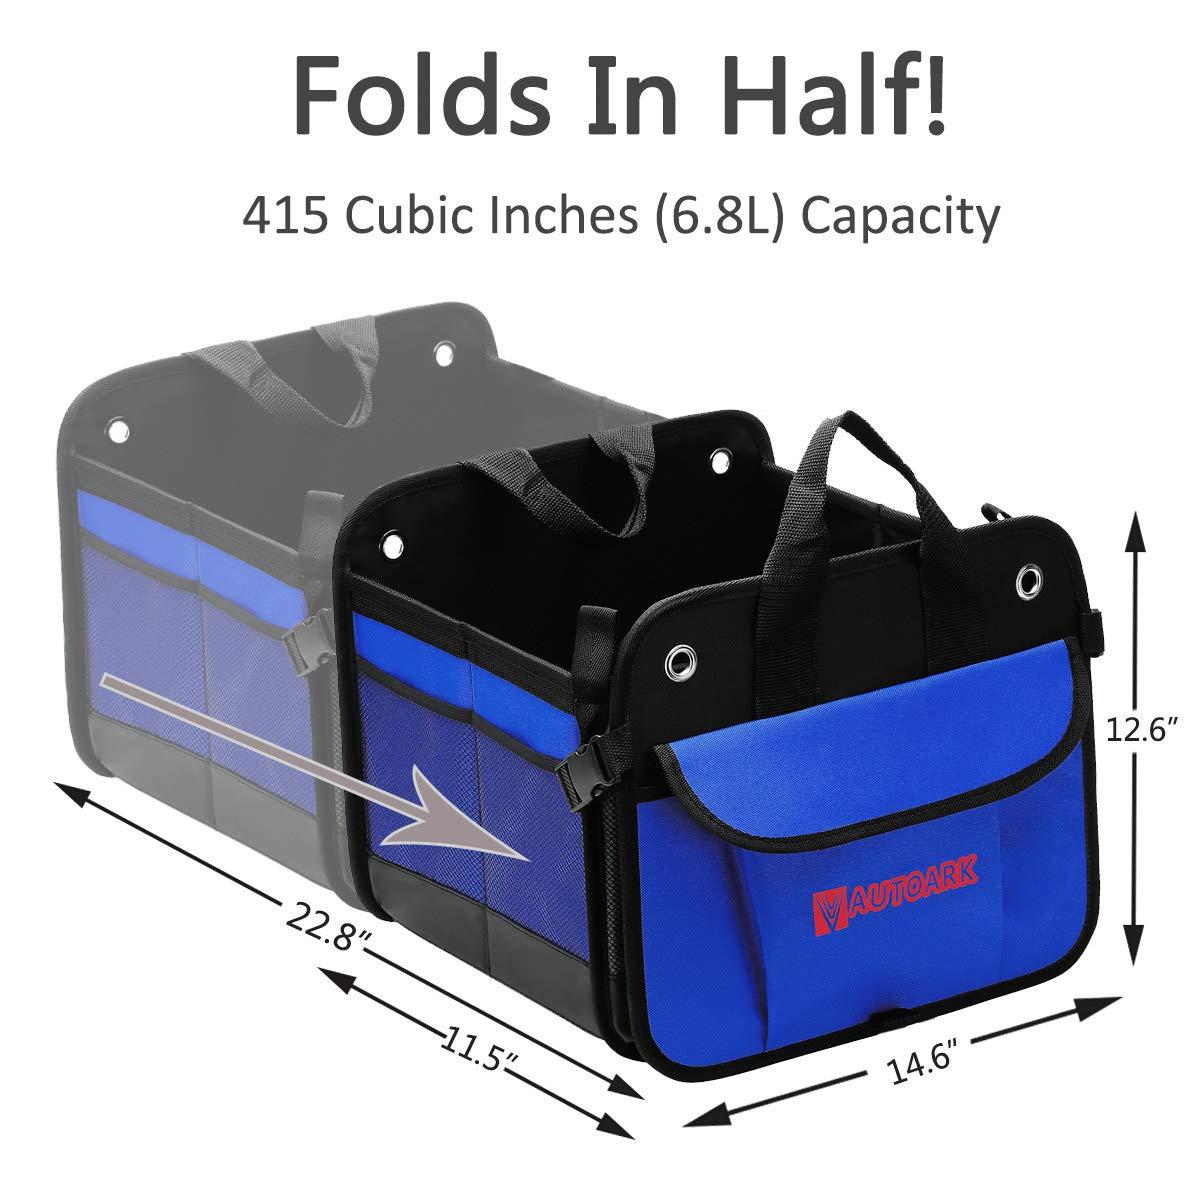 Autoark Multipurpose Car SUV Trunk Organizer,Durable Collapsible Adjustable Compartments Cargo Storage,AK-022 FBA/_AK-022